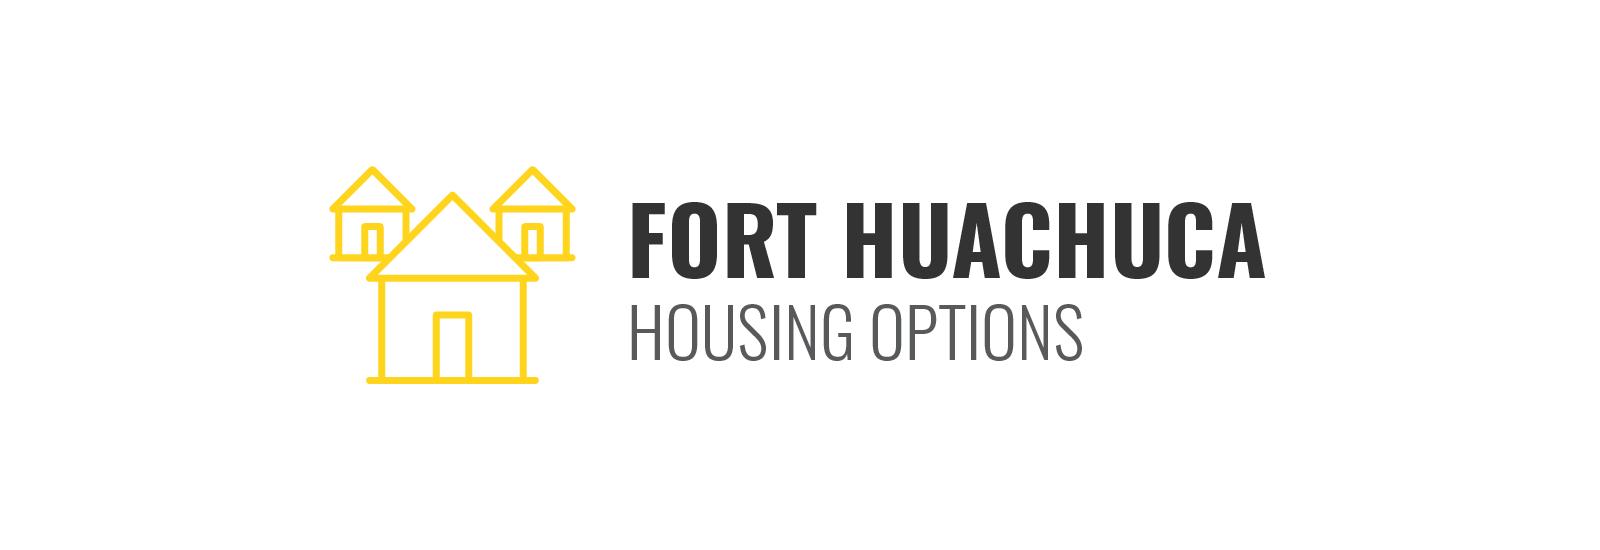 Fort Huachuca Housing Options